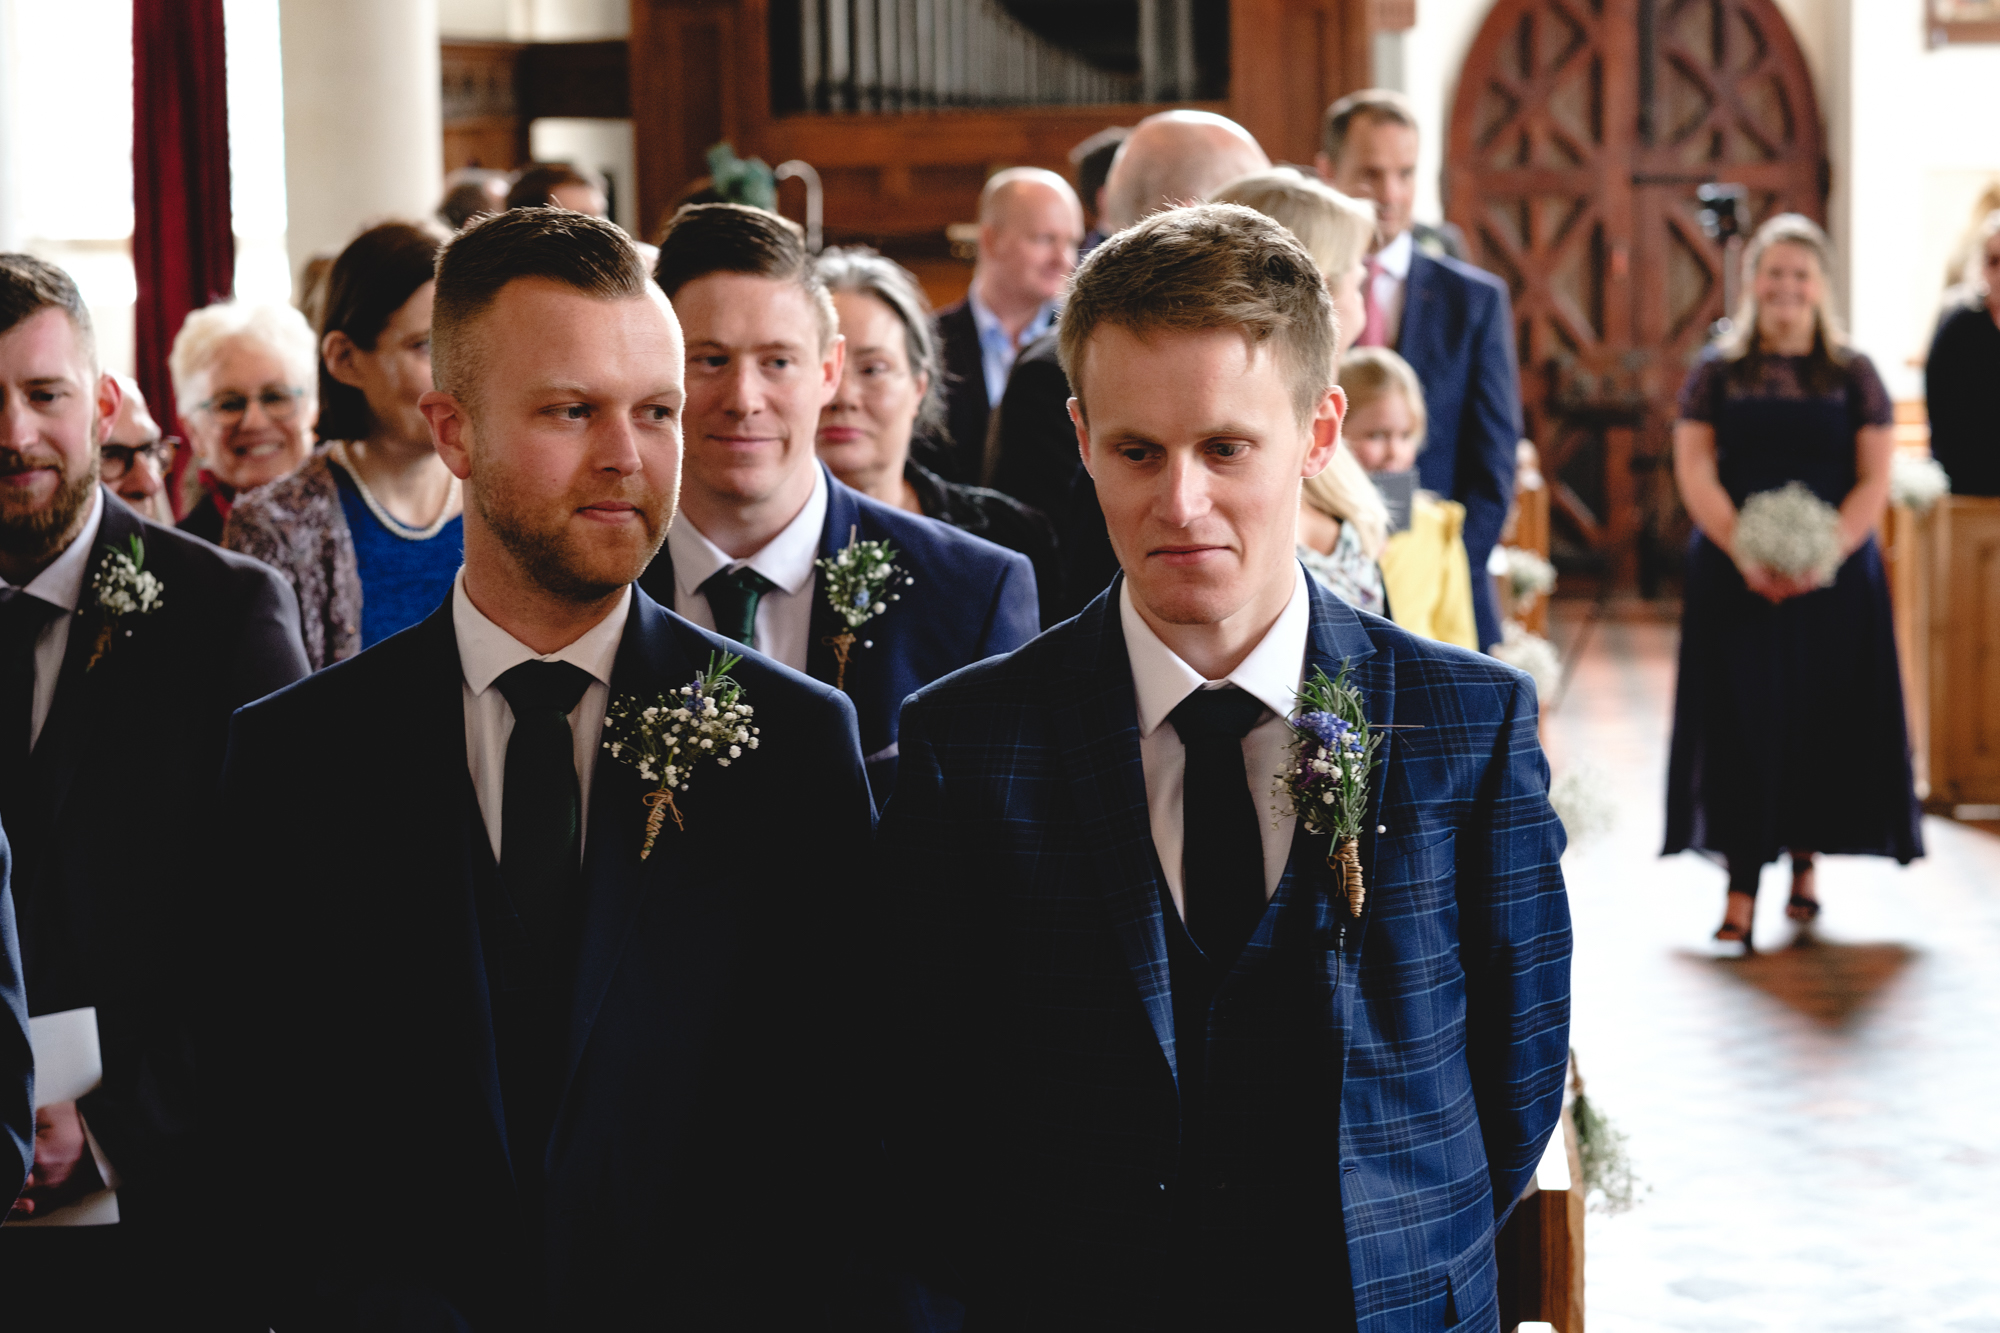 Katie and Dode weddings (44 of 207).jpg